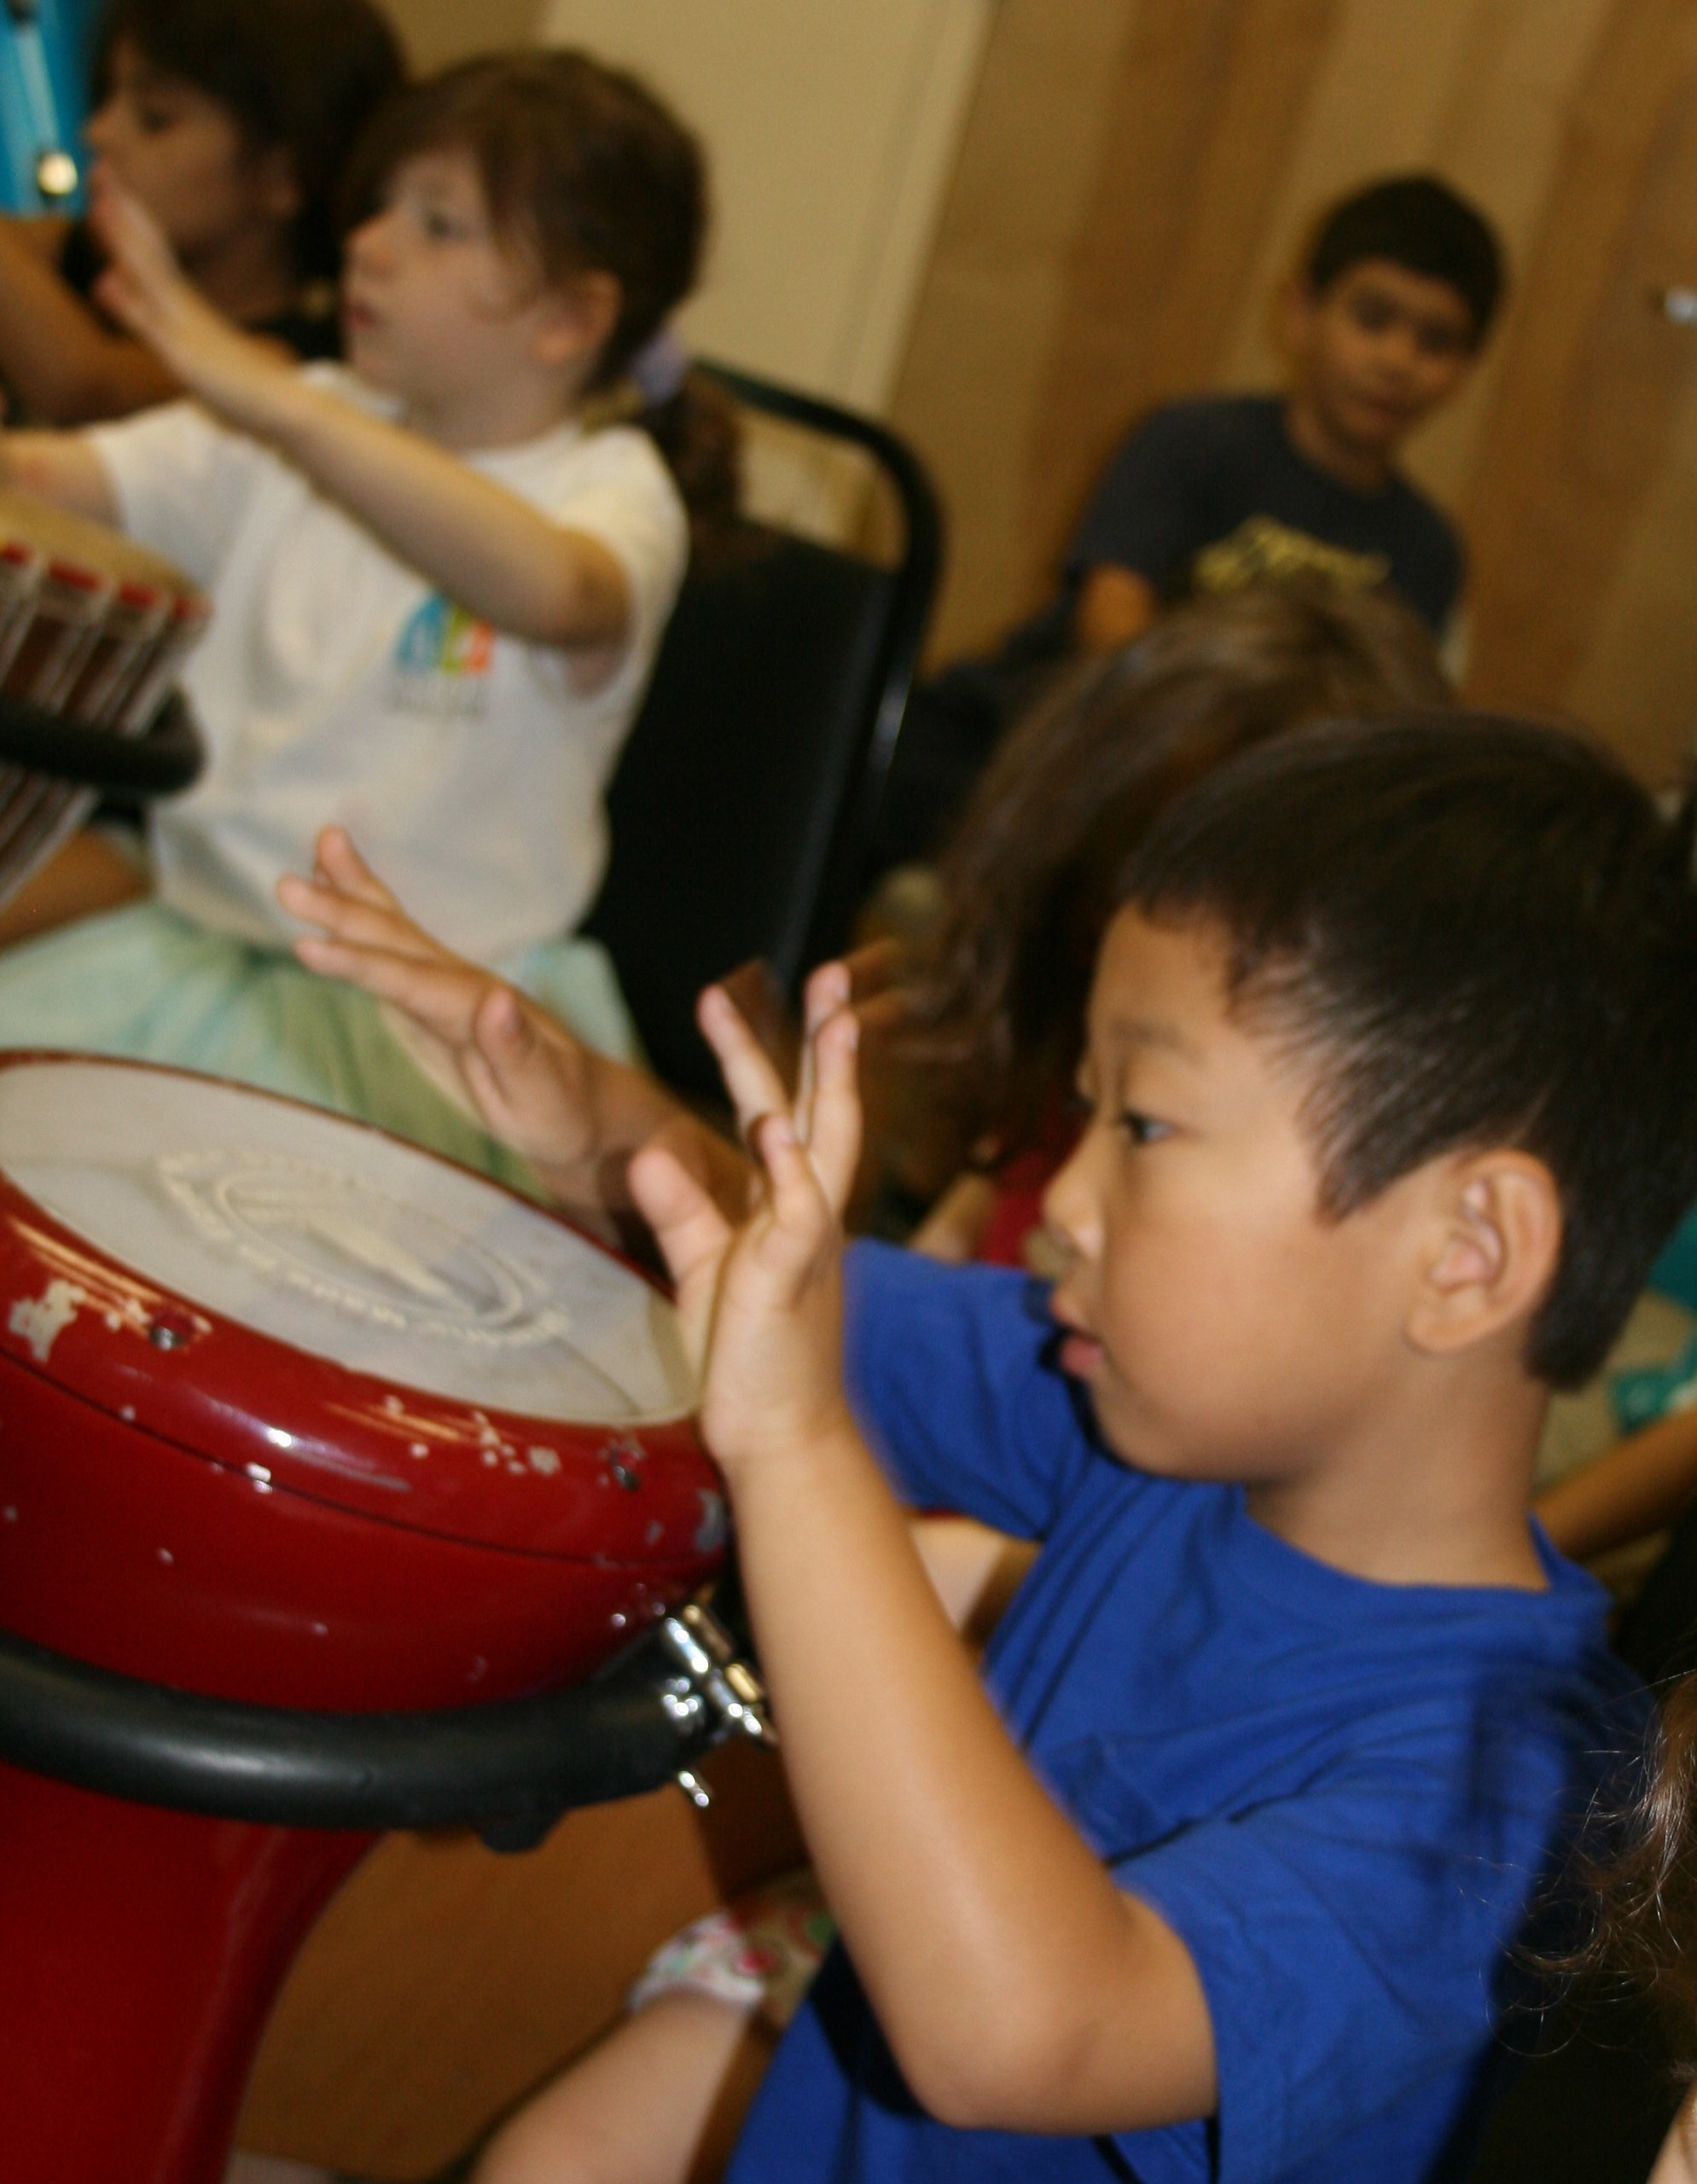 6a6ba4e4a1532fa40fa3_Boy_Drumming.jpg